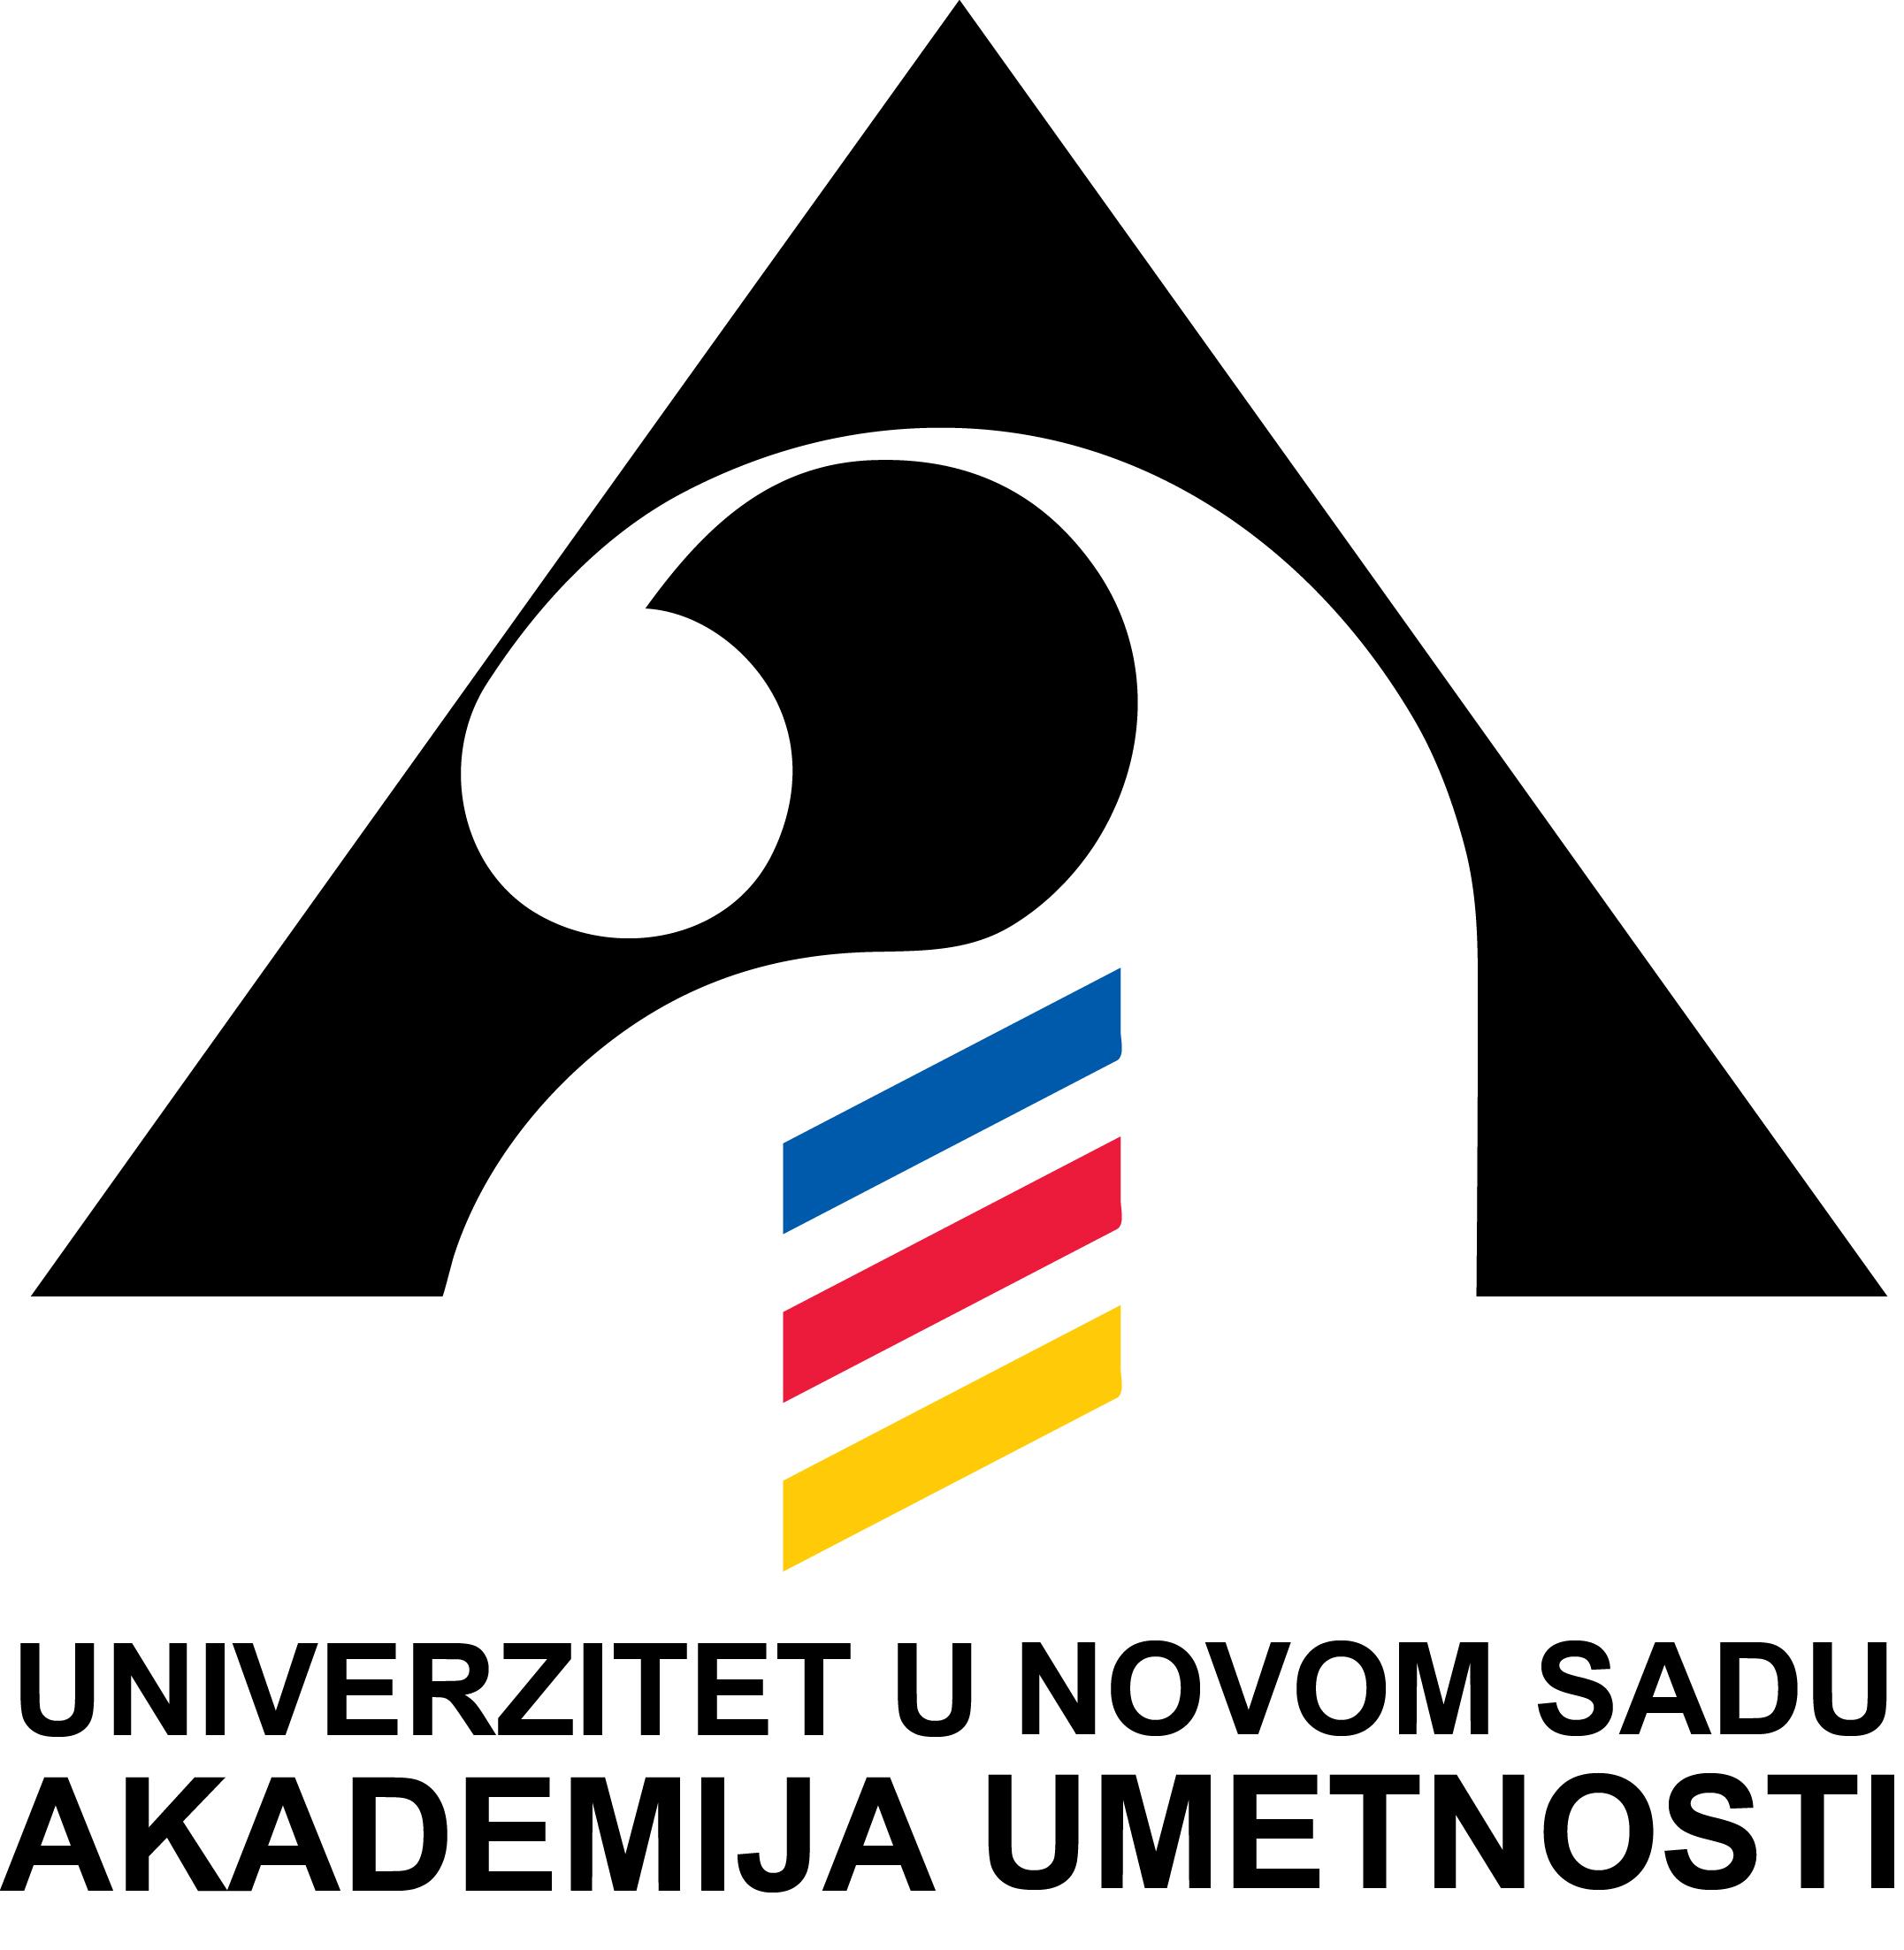 University of Novi Sad - Academy of Arts